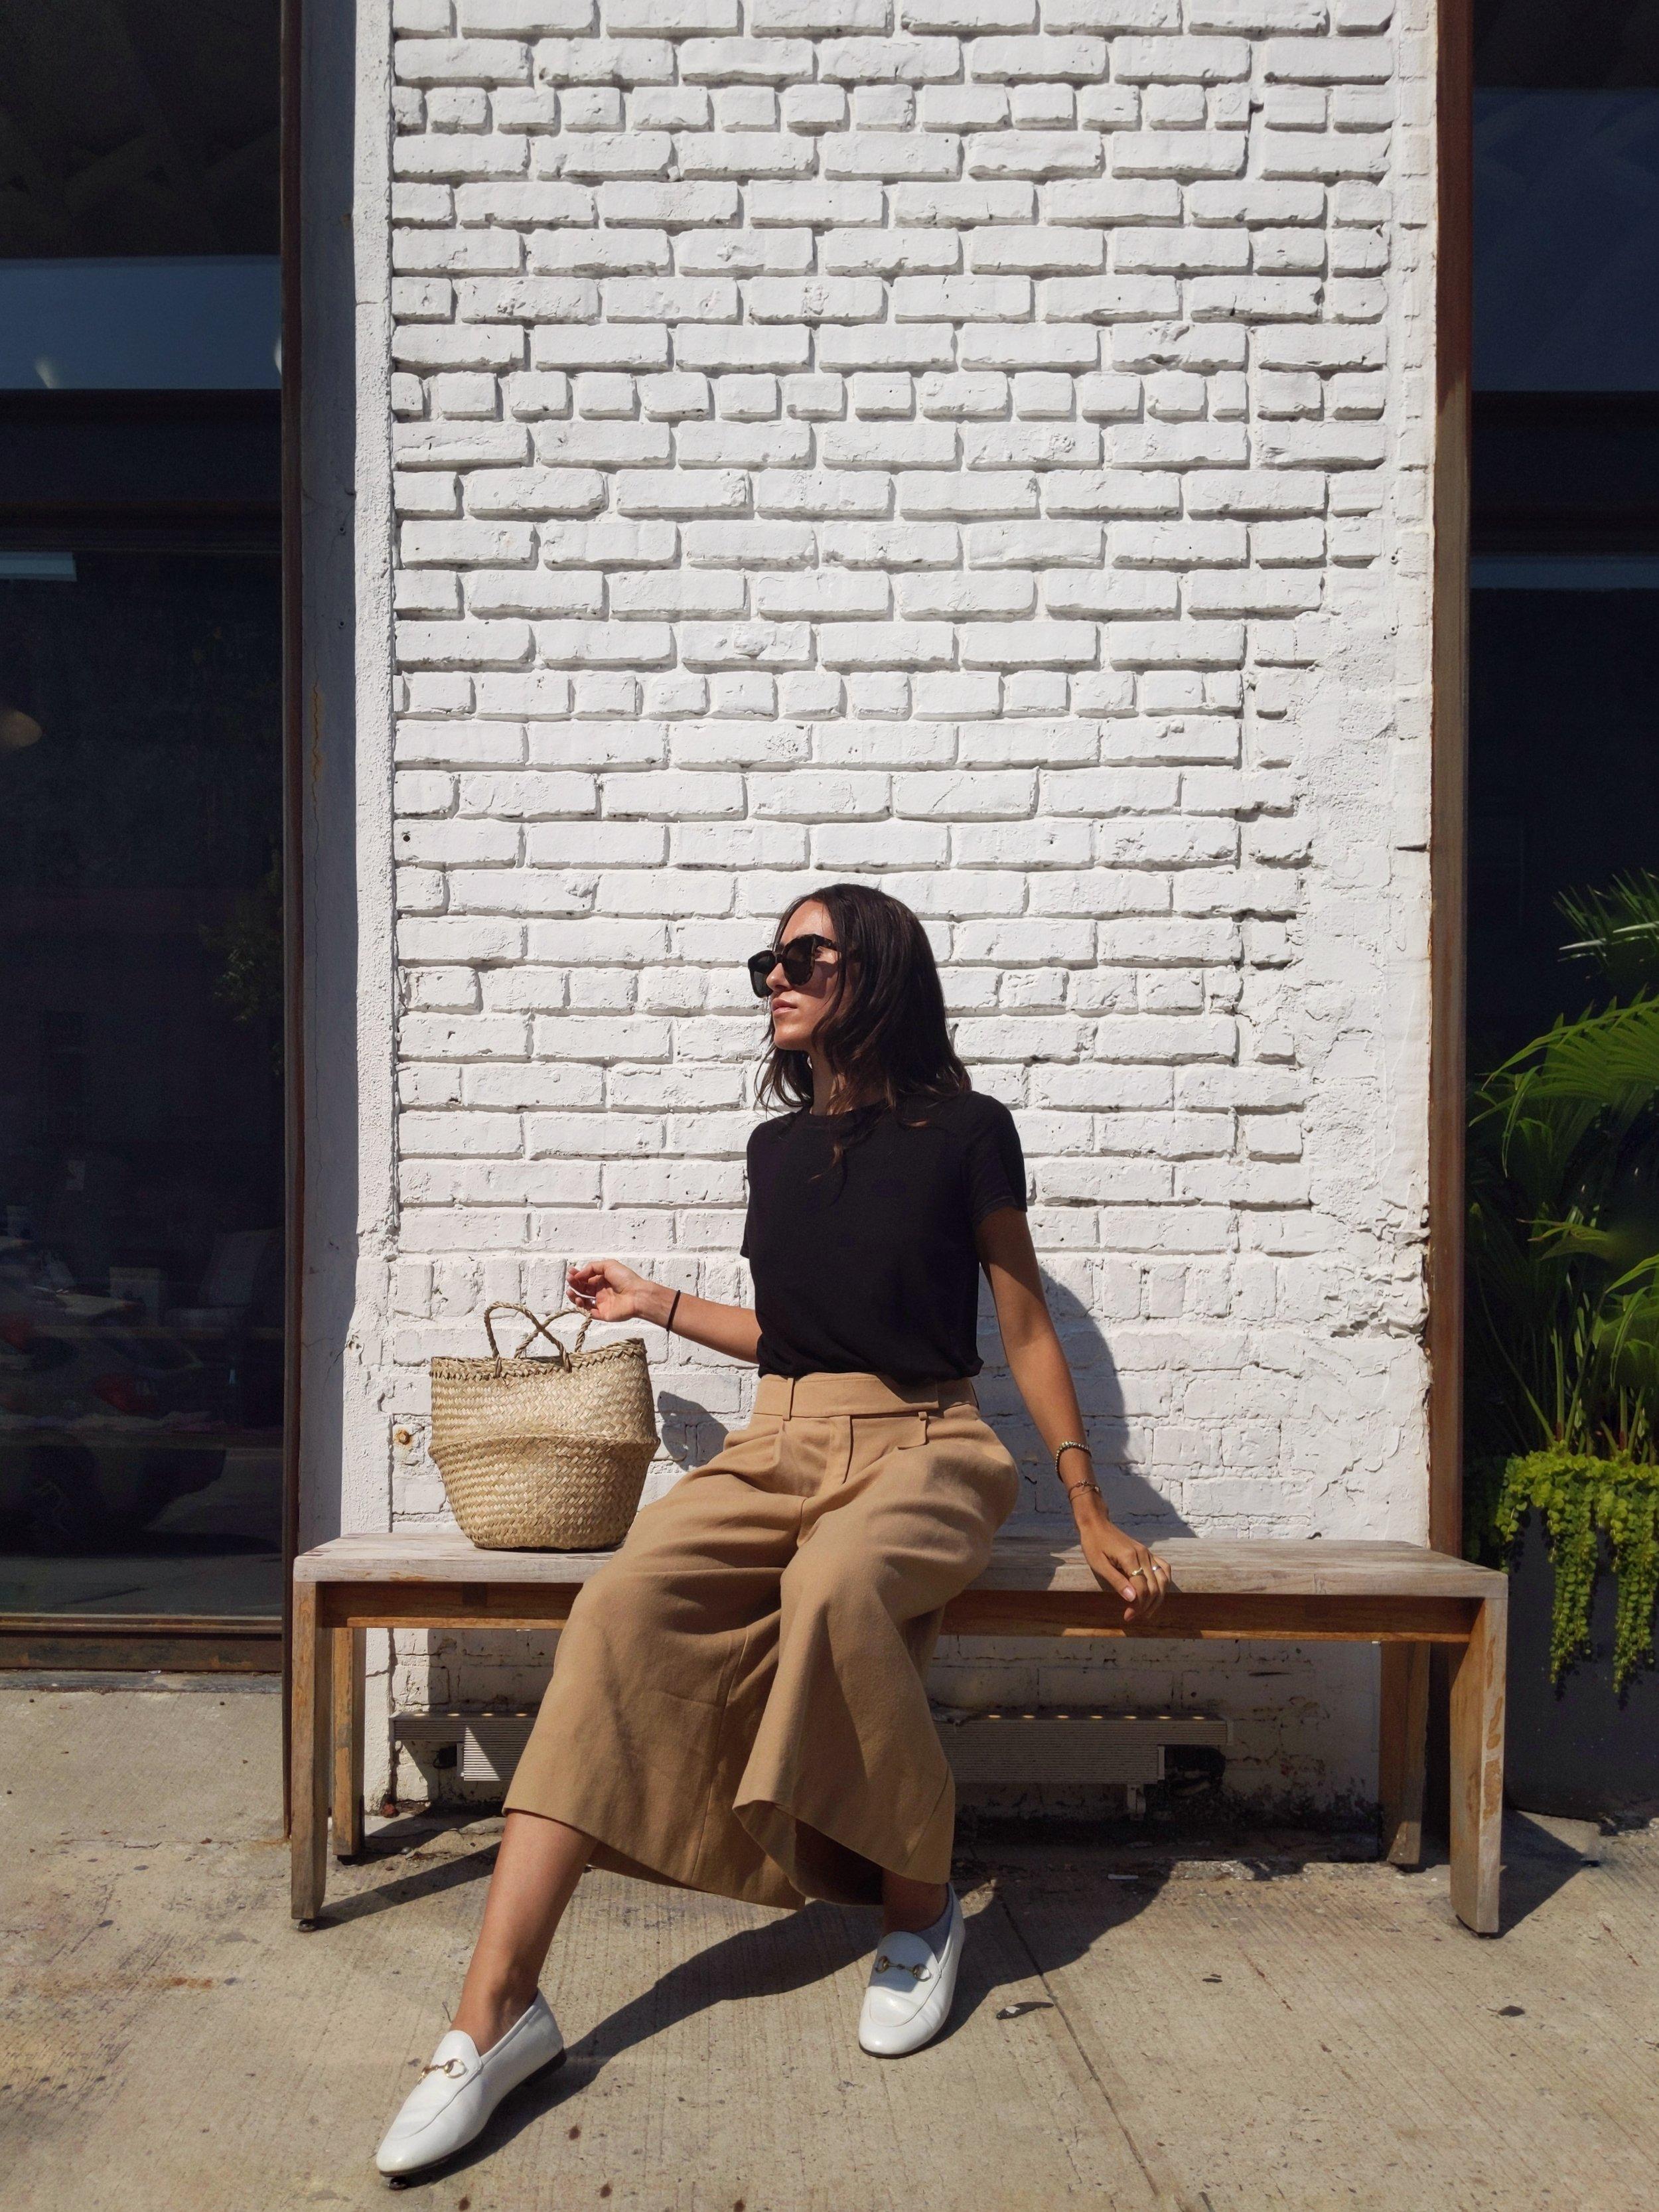 Wearing: F21  top  | Jil Sander Navy  pants  | Sephora  straw bag